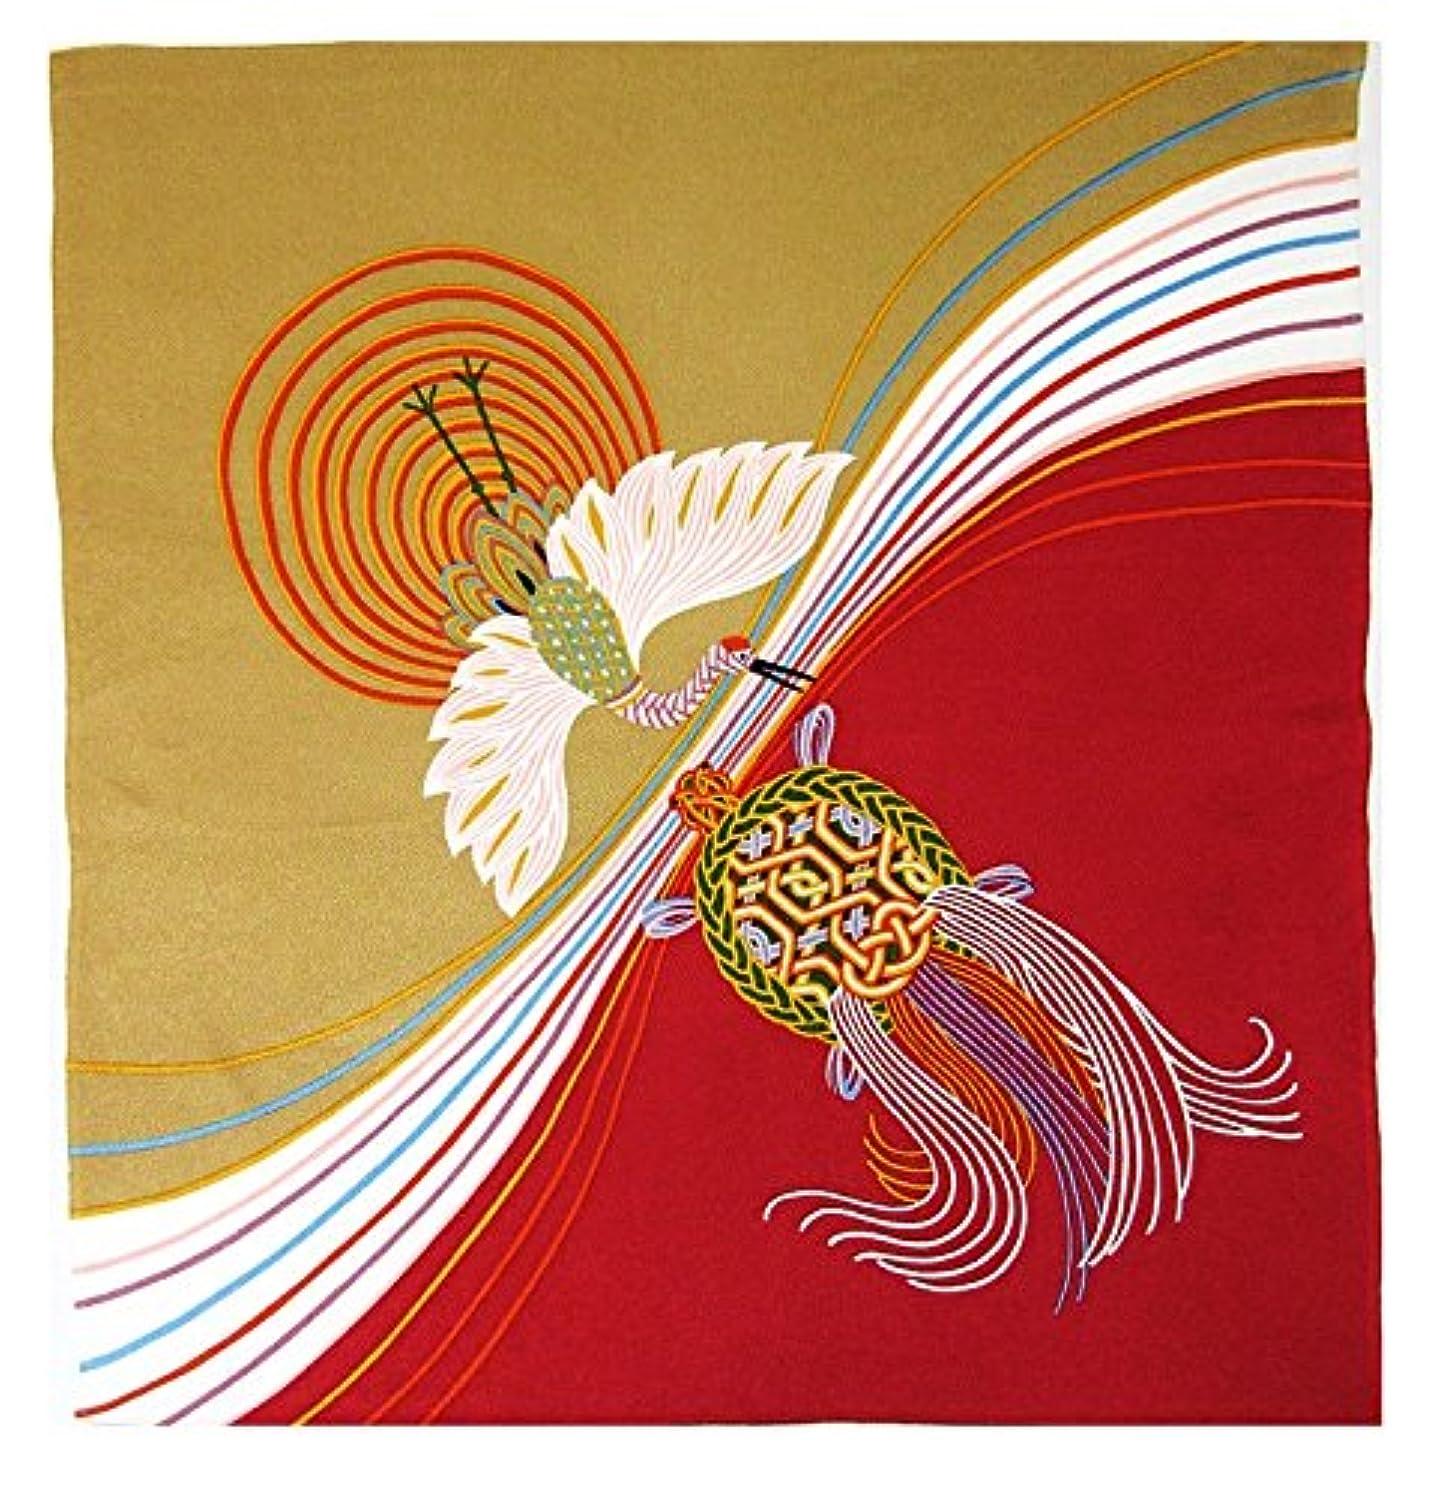 [L/27inc] FUROSHIKI- Japanese Traditional Wrapping Cloth (Rainbow and crane, tortoise)